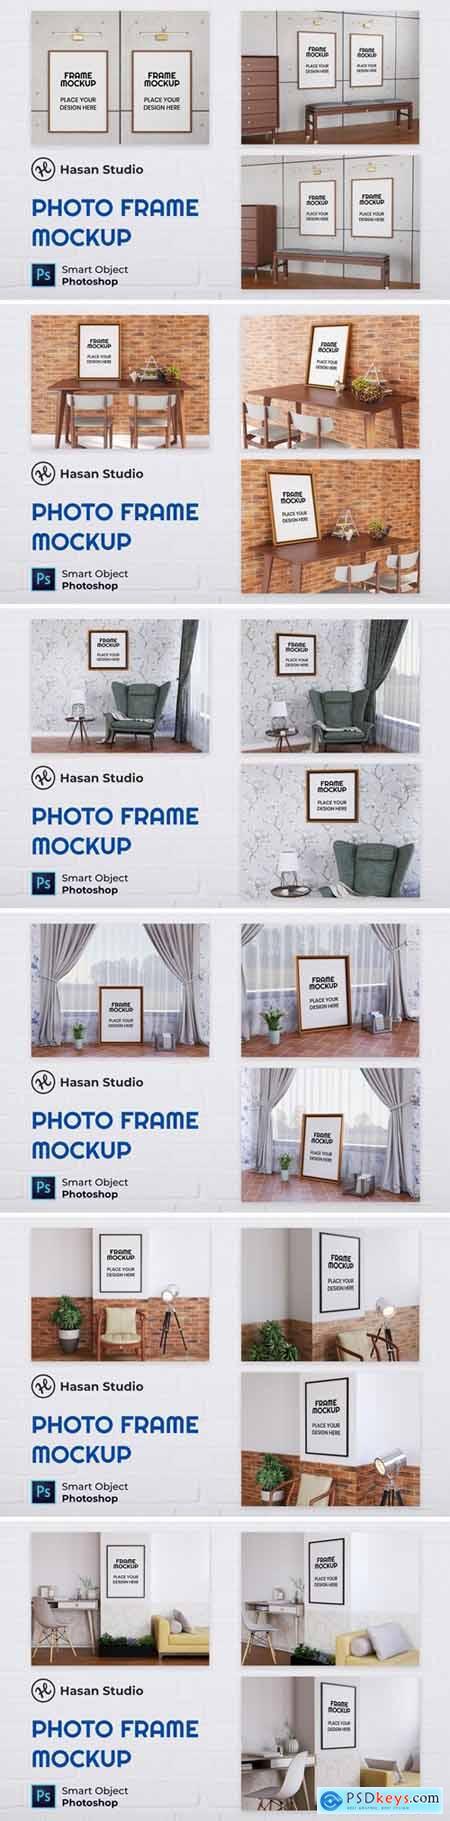 Blank Photo Frame Mockup - Nuzie687